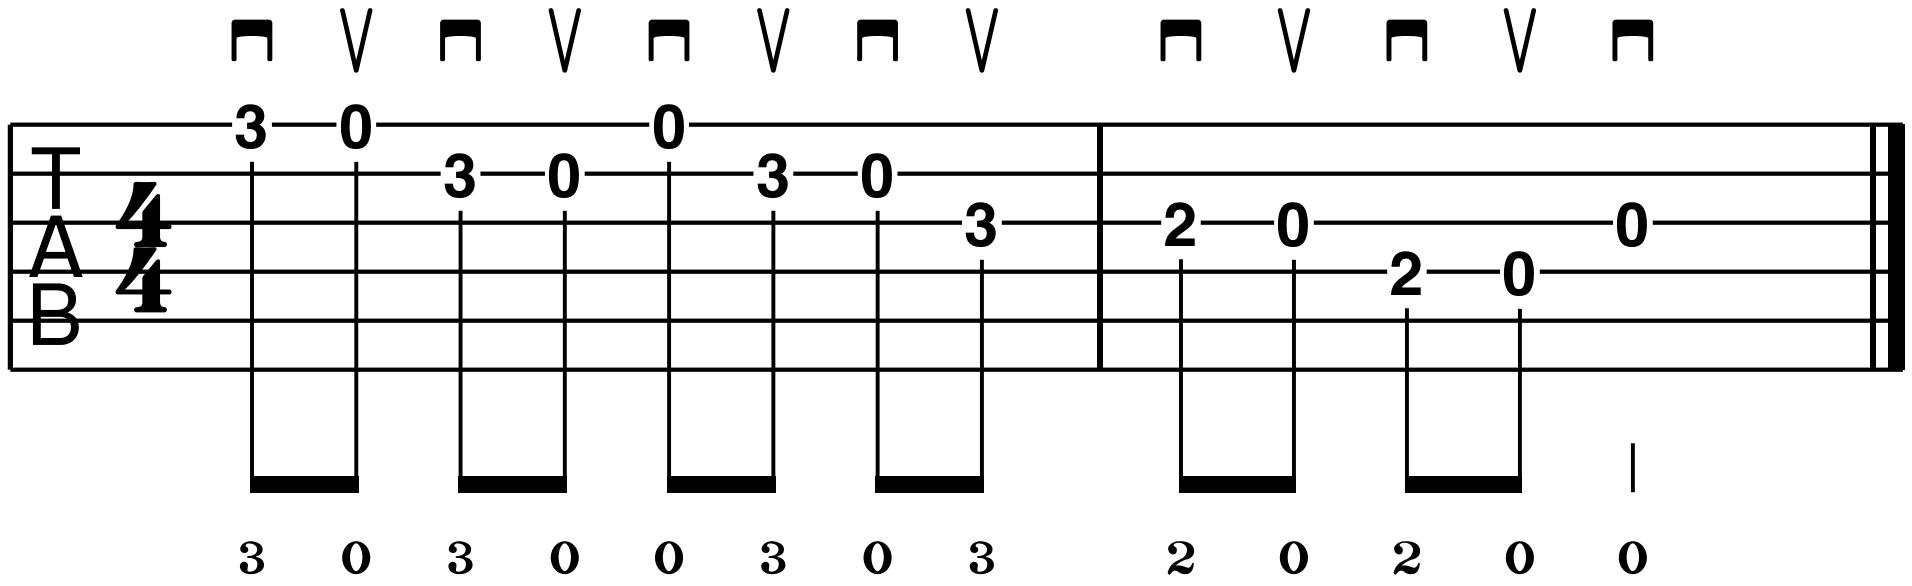 left hand fingering guitar tablature